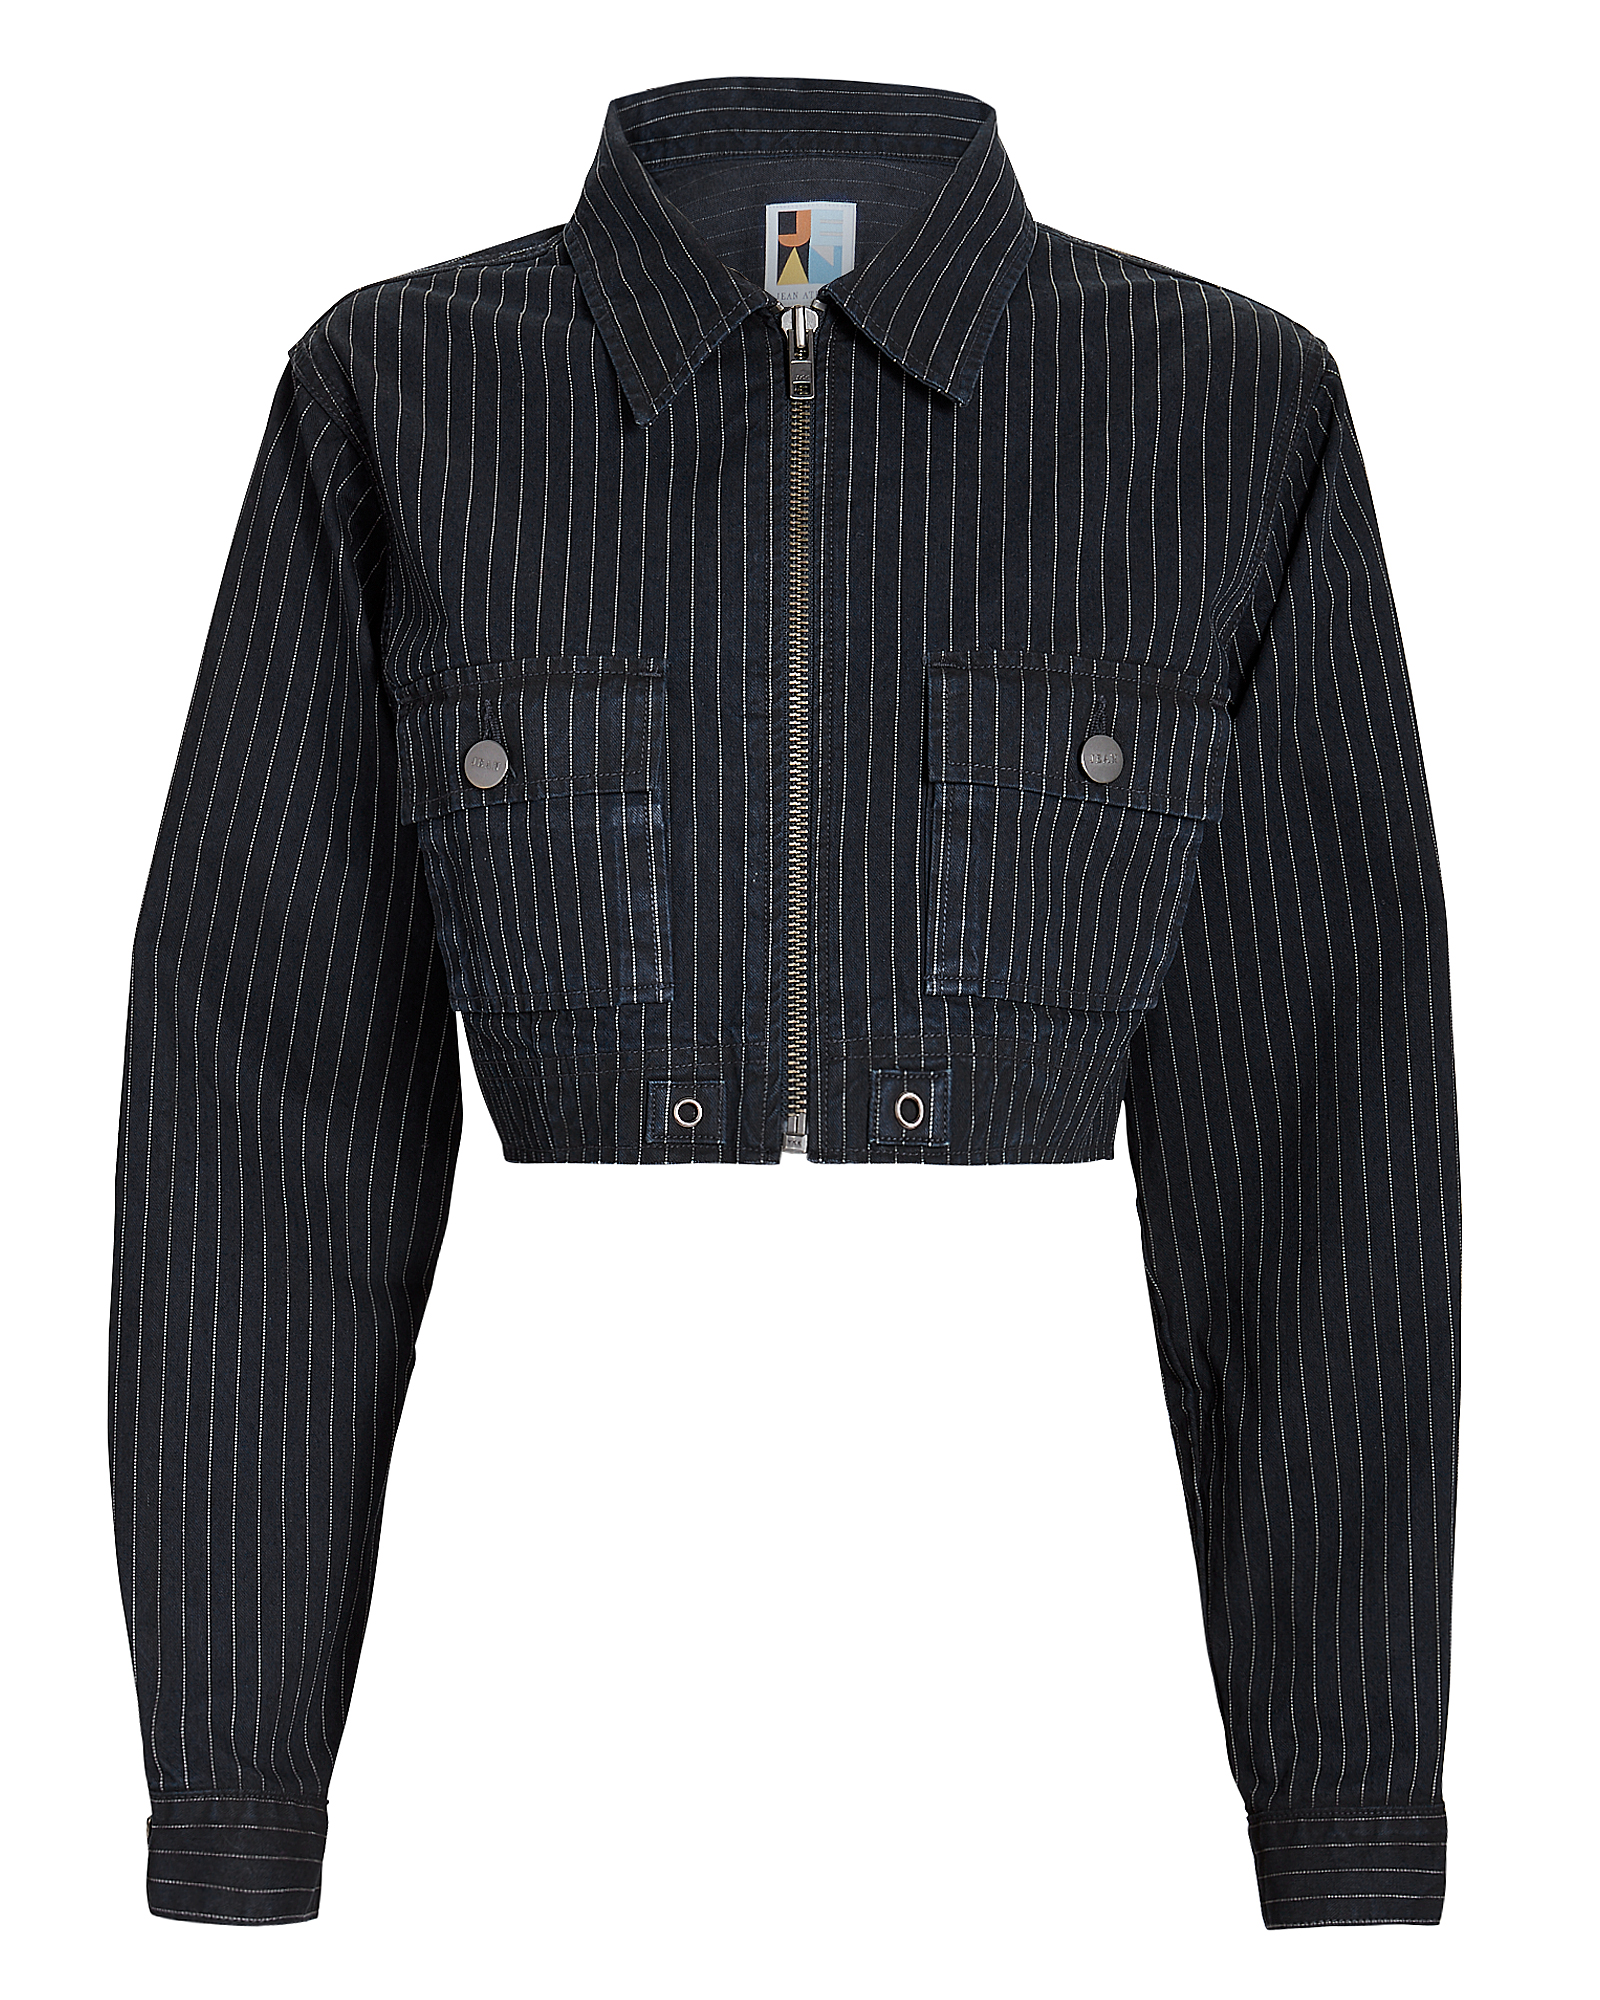 Alix Crop Jacket Deni-Drk